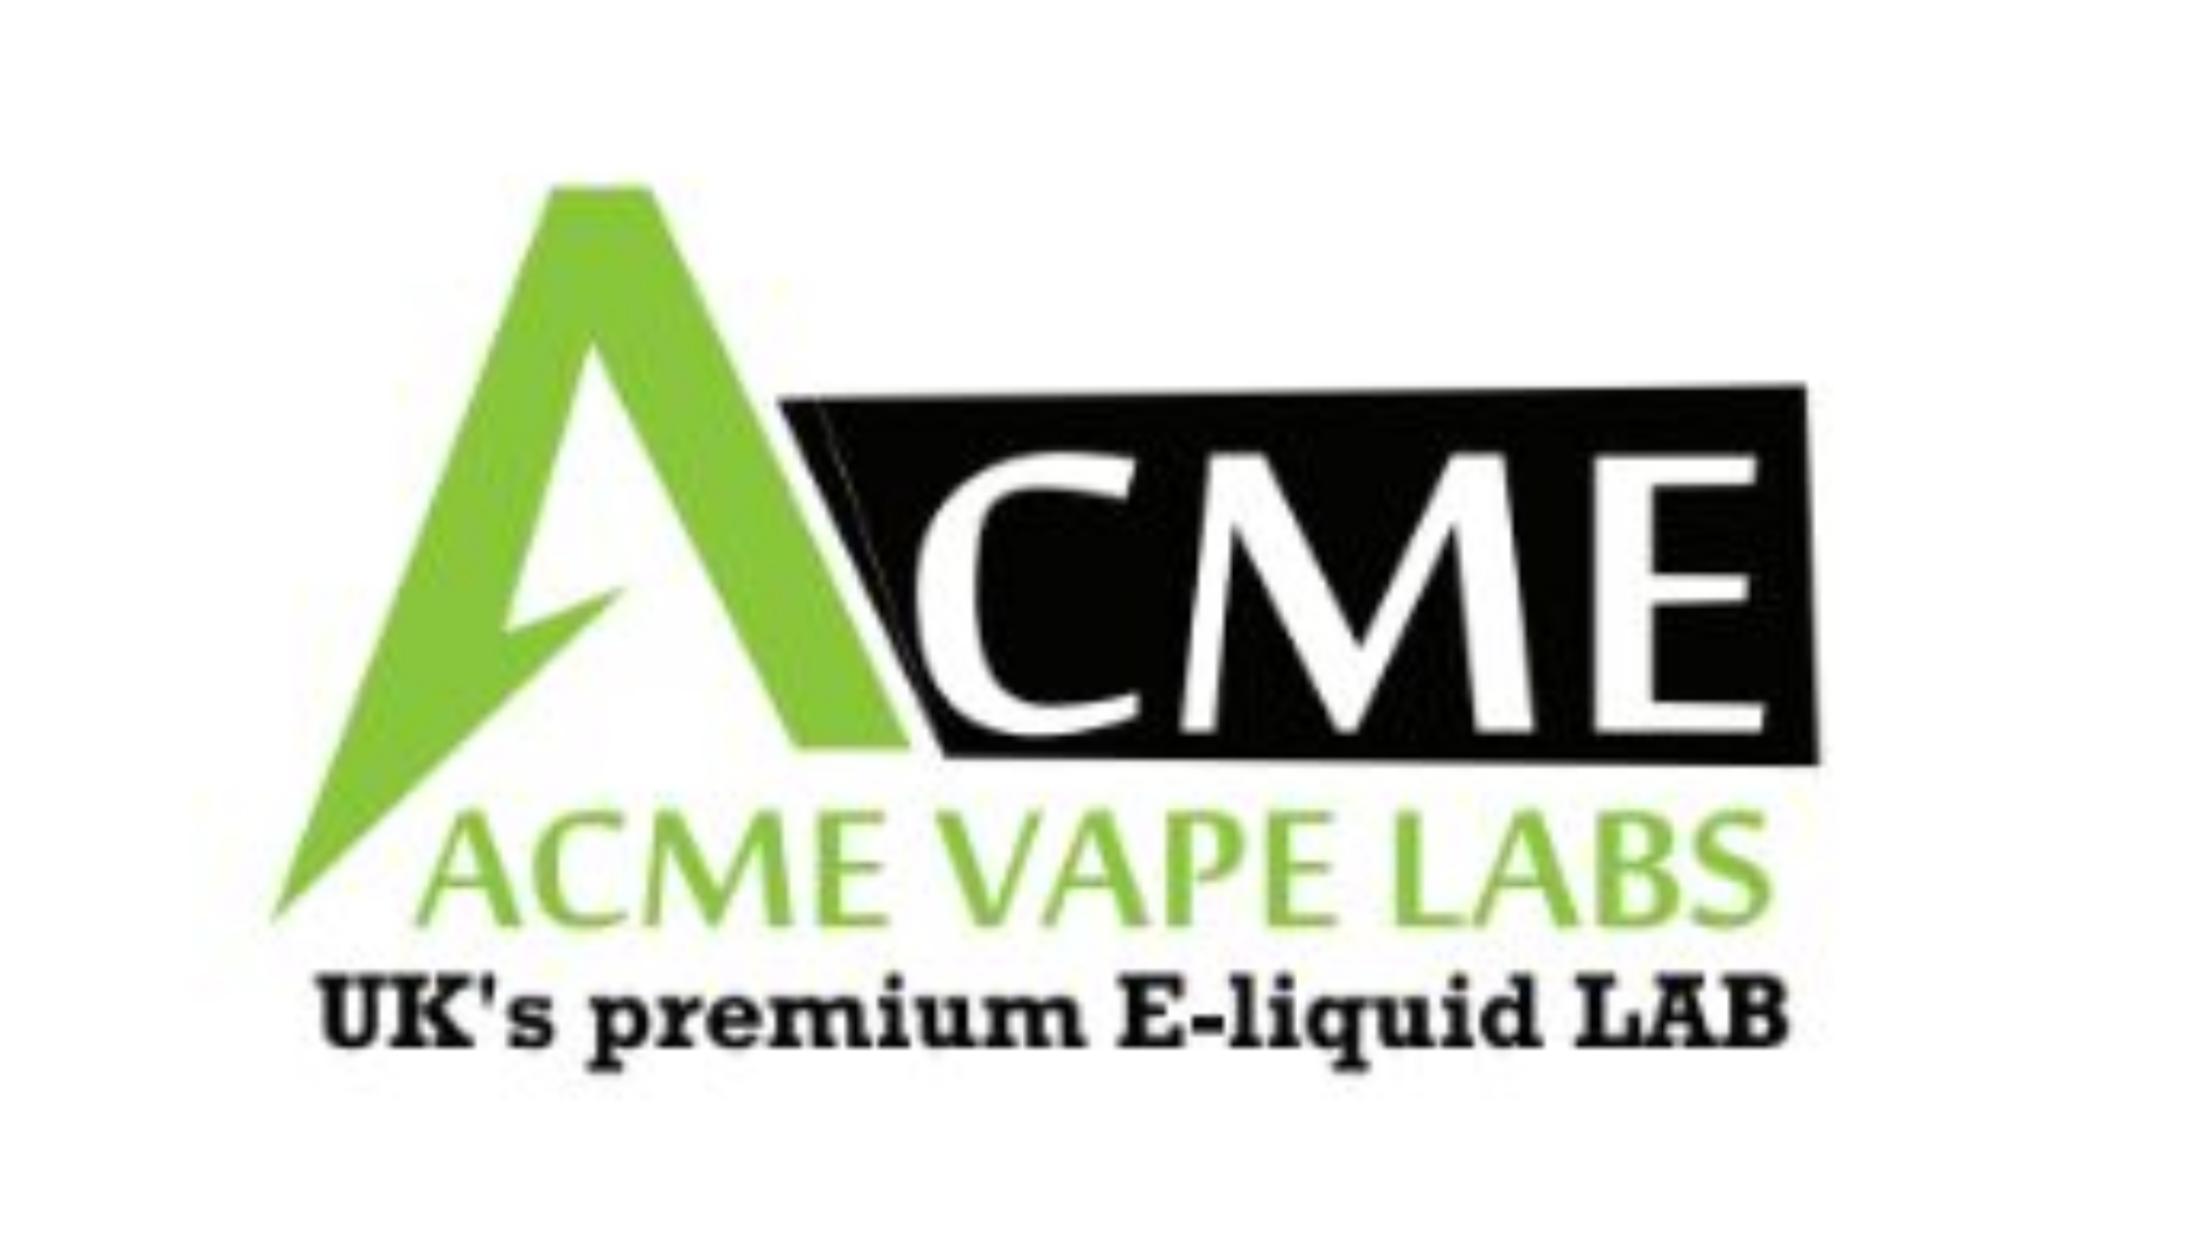 HOME | ACME VAPE LABS